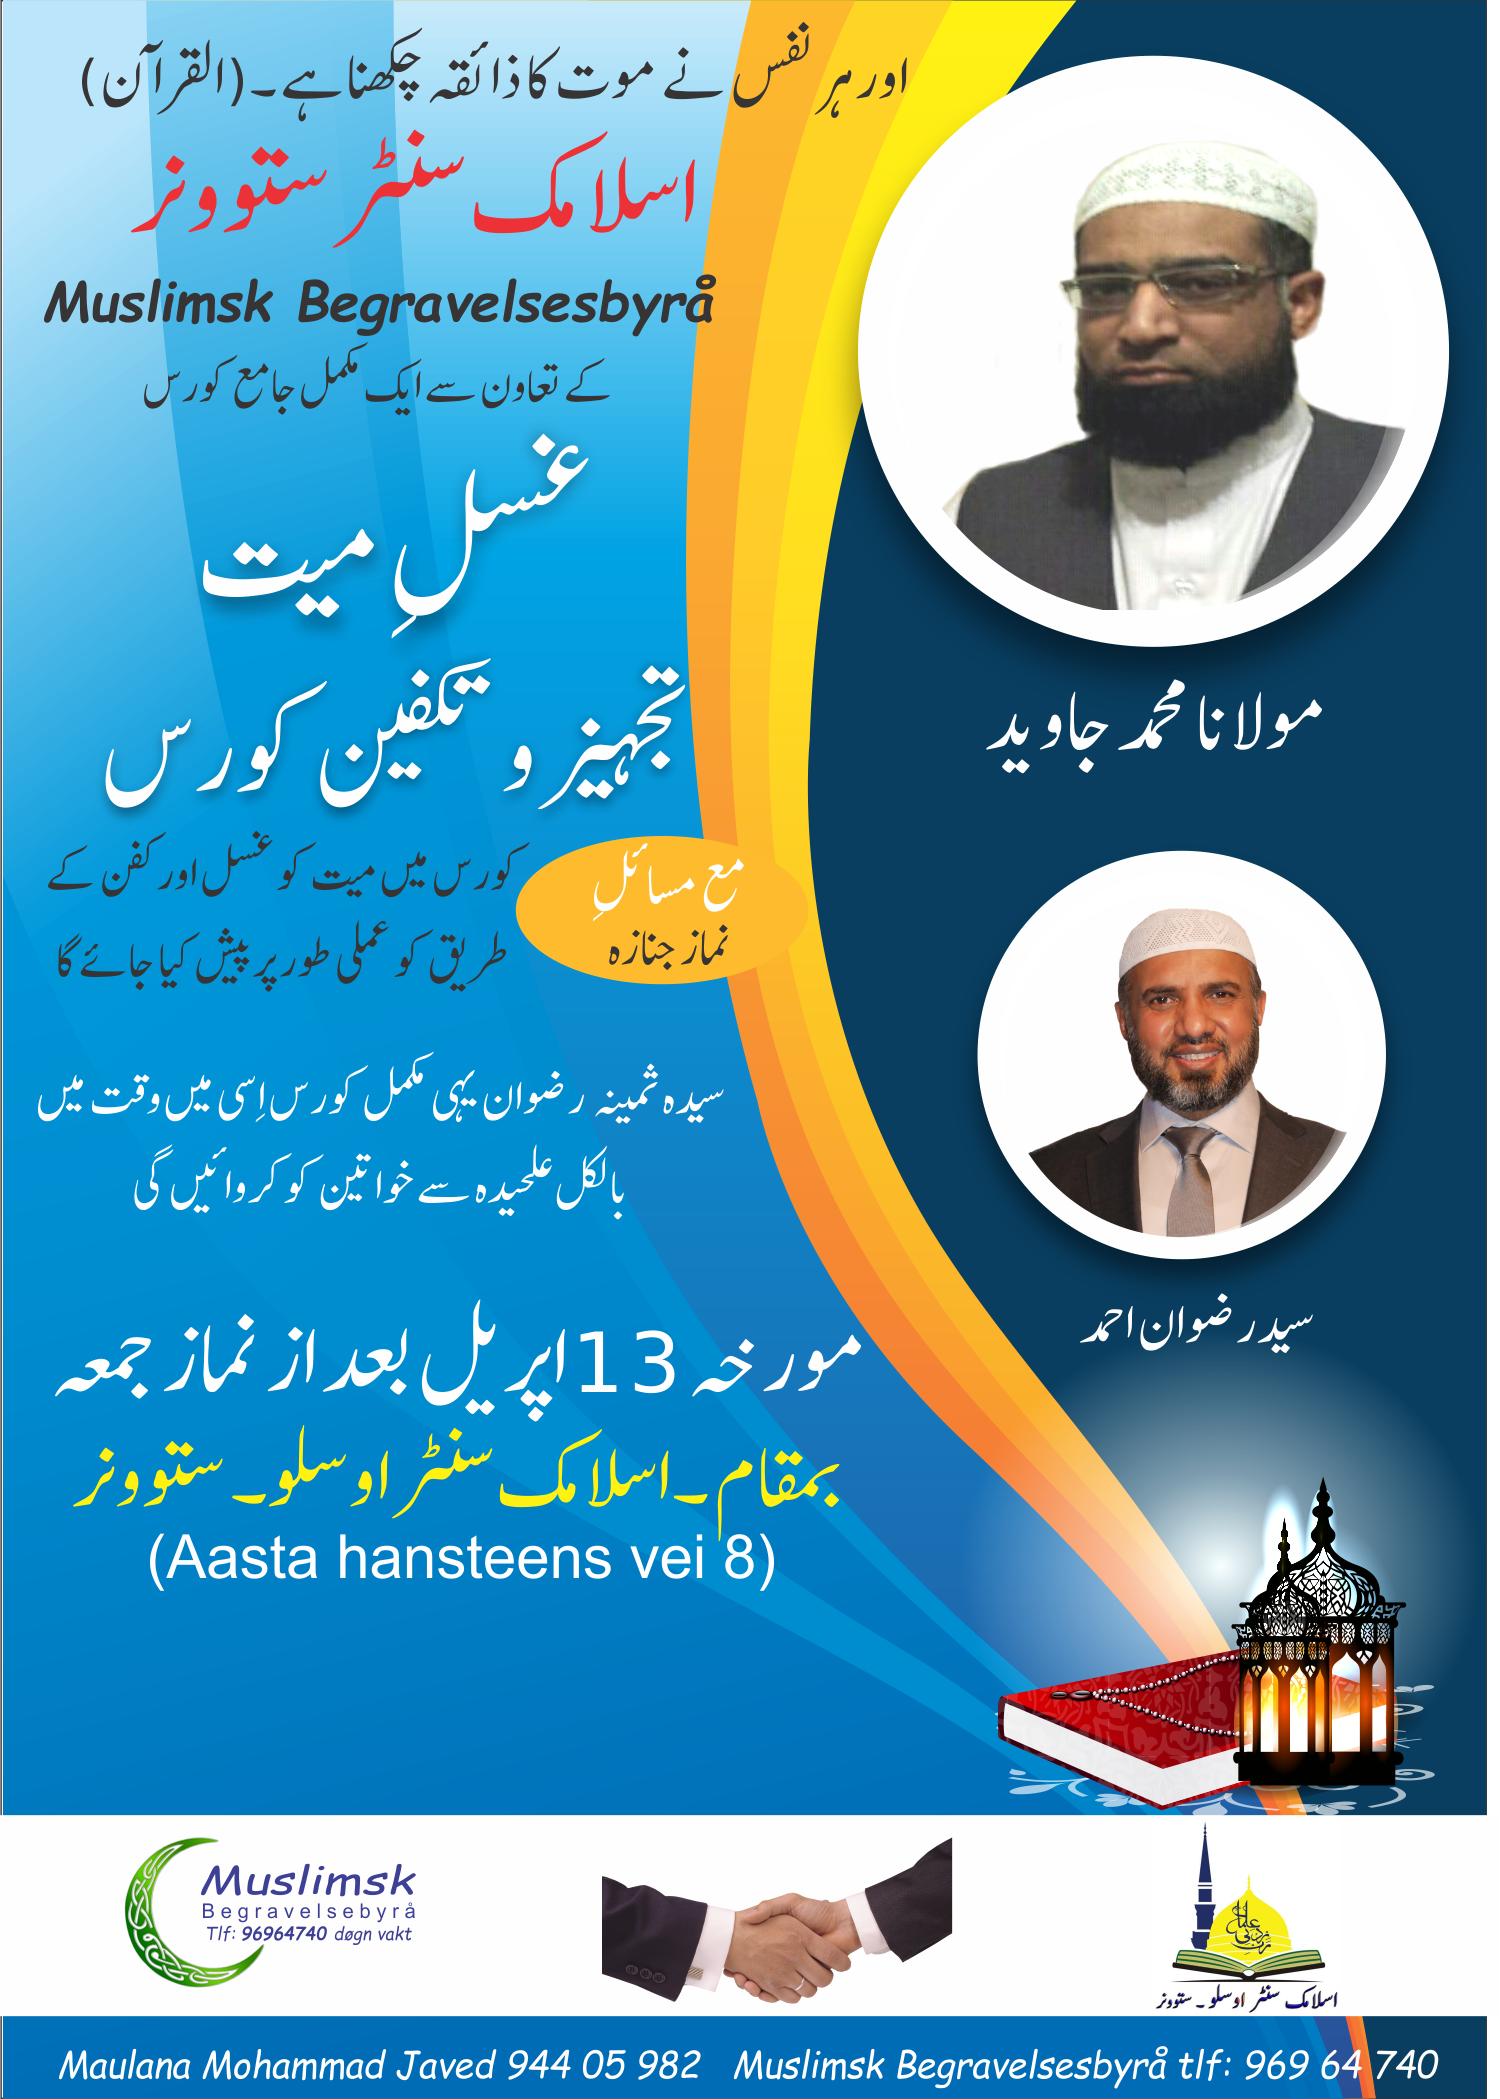 Janazah kurs Muslimsk Begravelsebyrå islamic centre Oslo